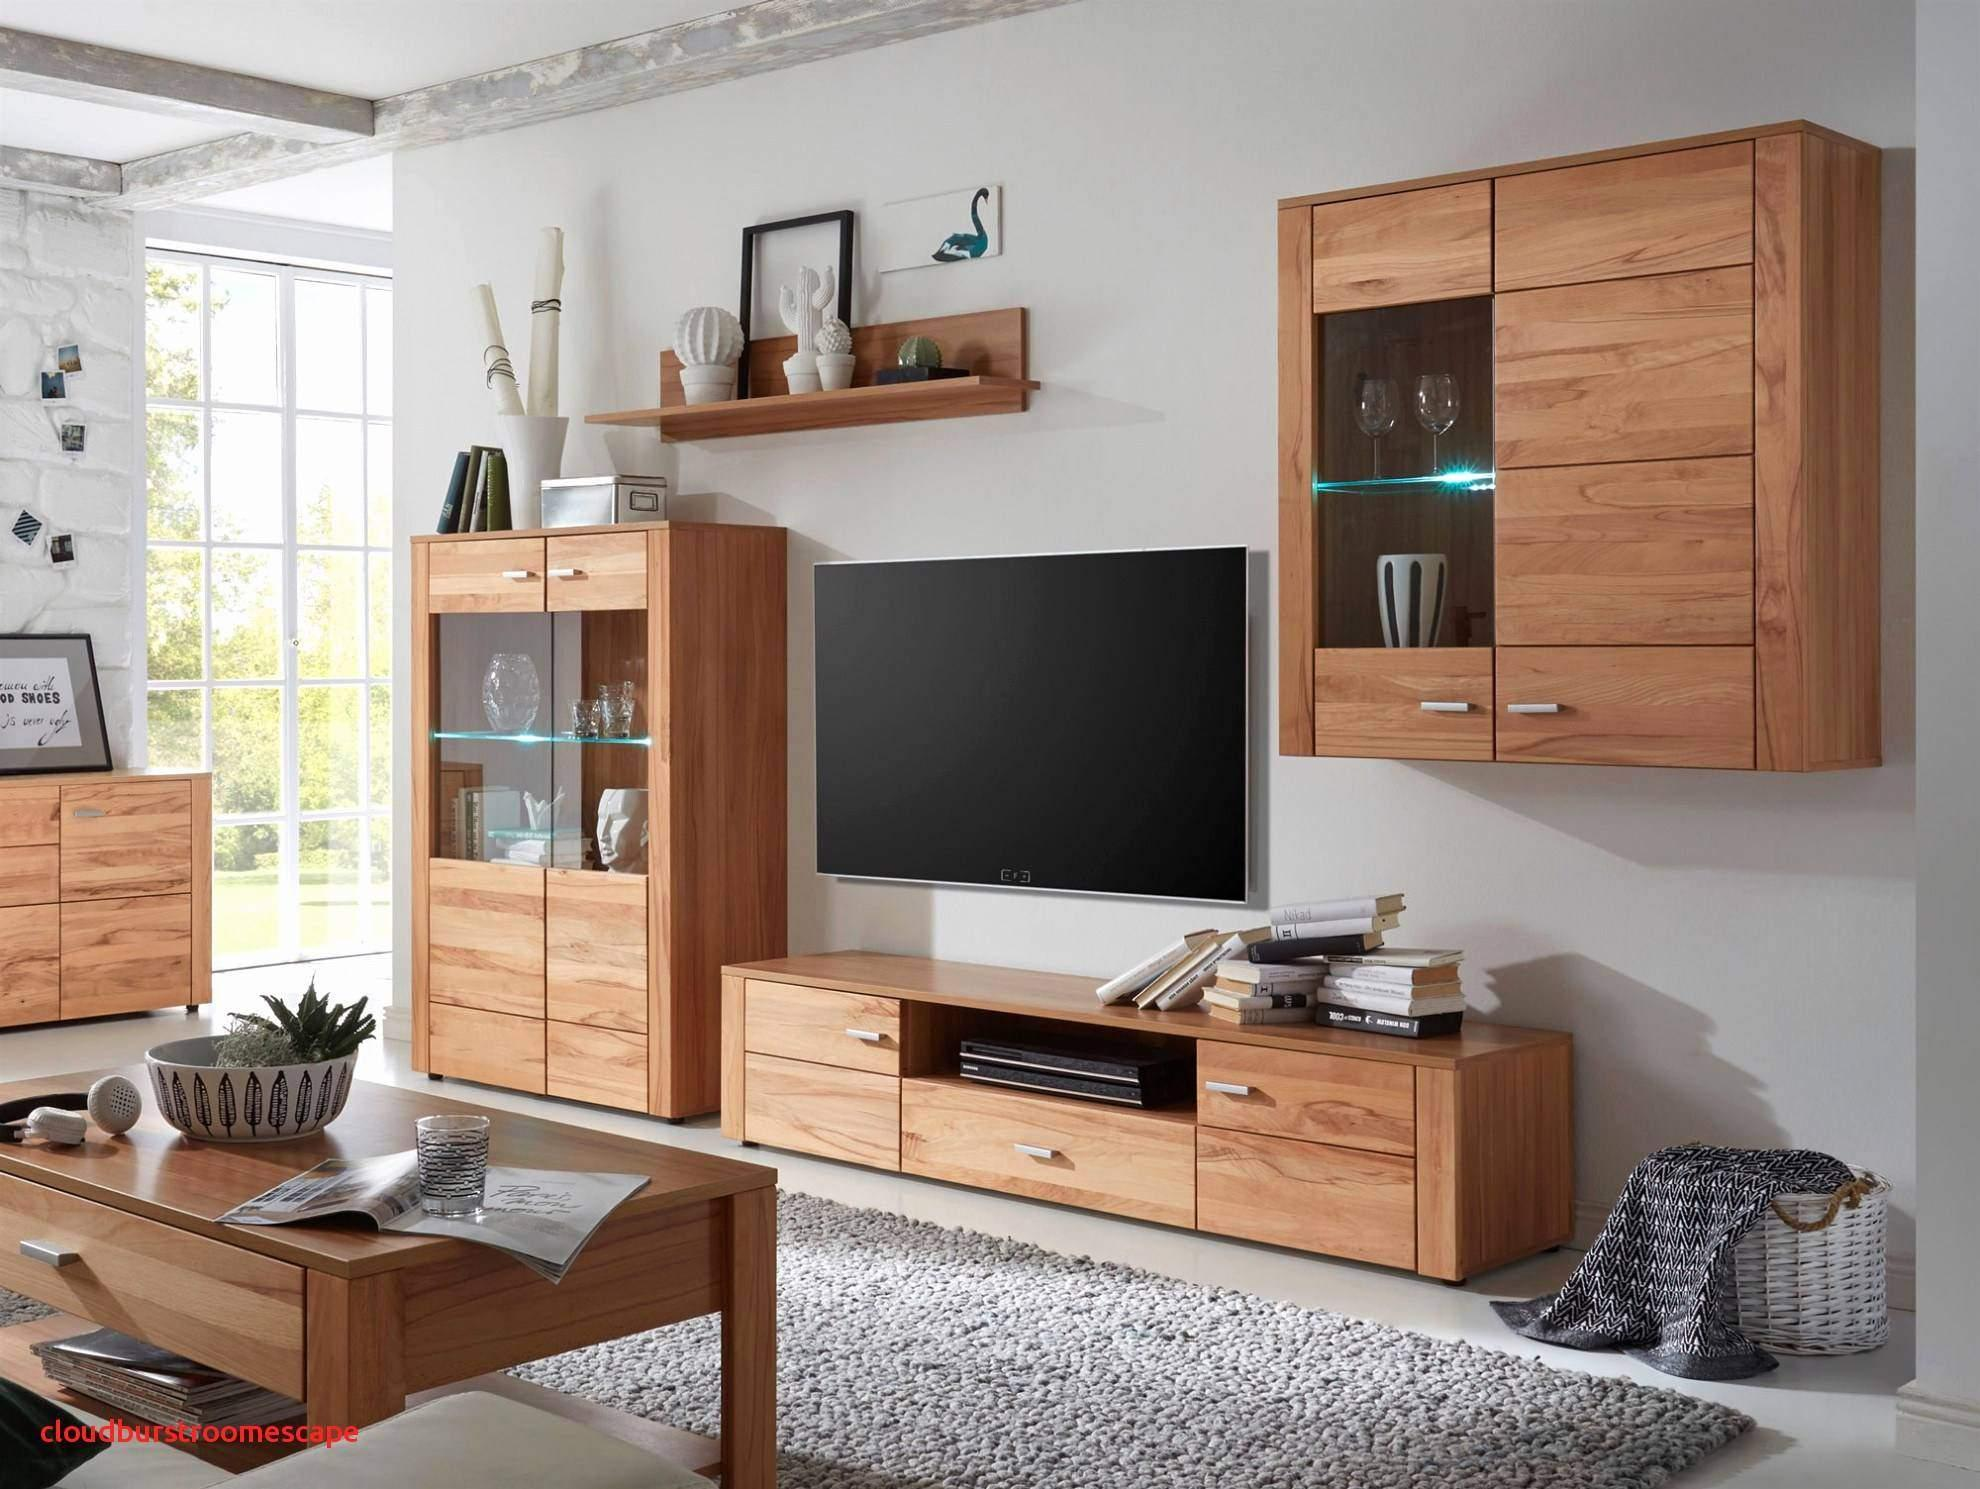 Wohnzimmer Wand Echtholz